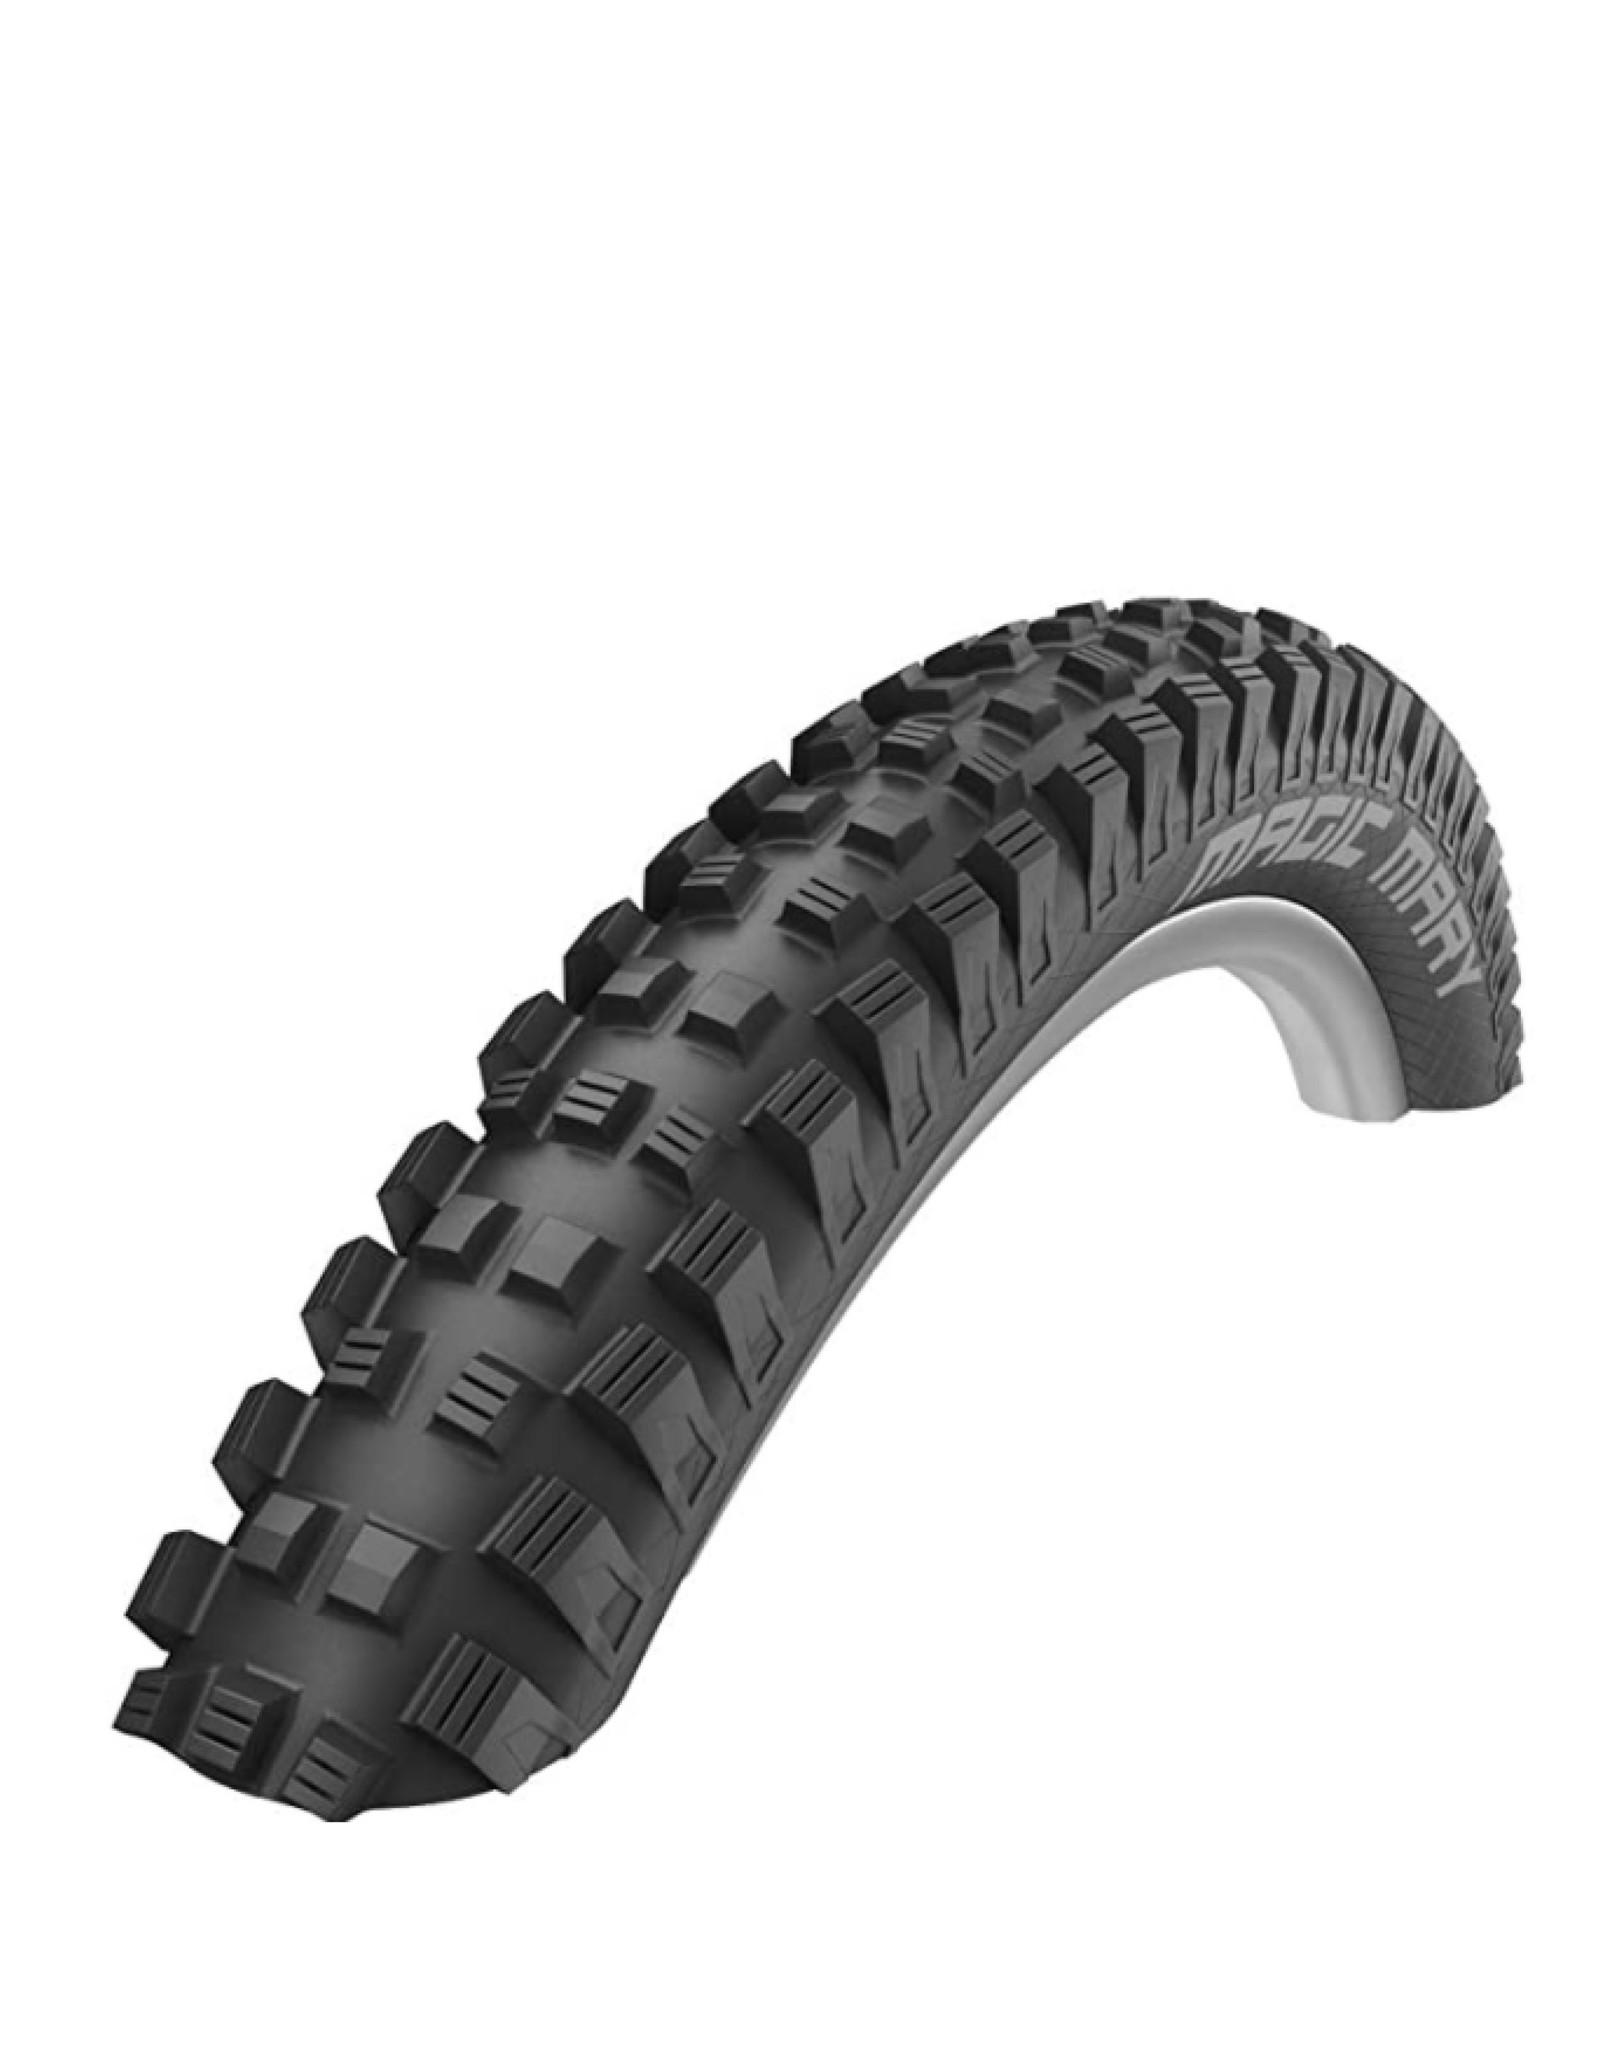 Schwalbe Pneu Schwalbe, Magic Mary Addix, Tire, 26'', 2.35, Wire, Compound: Addix, Tech: TwinSkin, BikePark, TPI: 20D2, PSI: 23-50, 1400g, Black